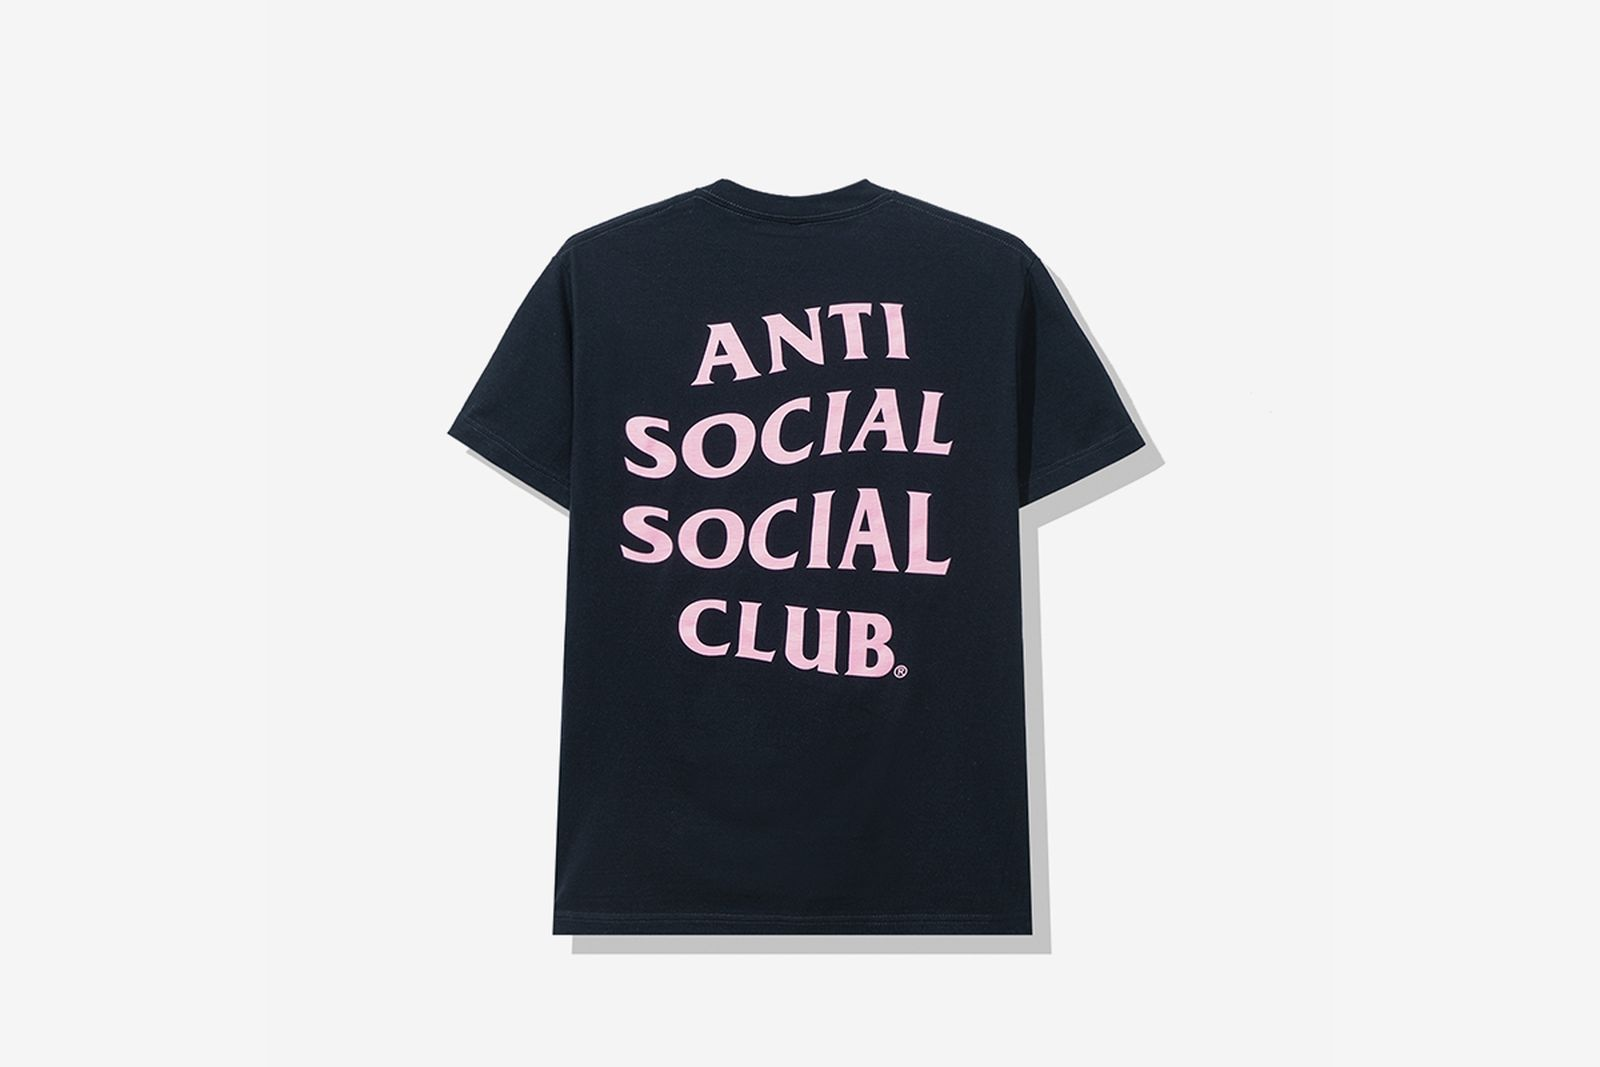 anti-social-social-club-usps-collaboration-2-14